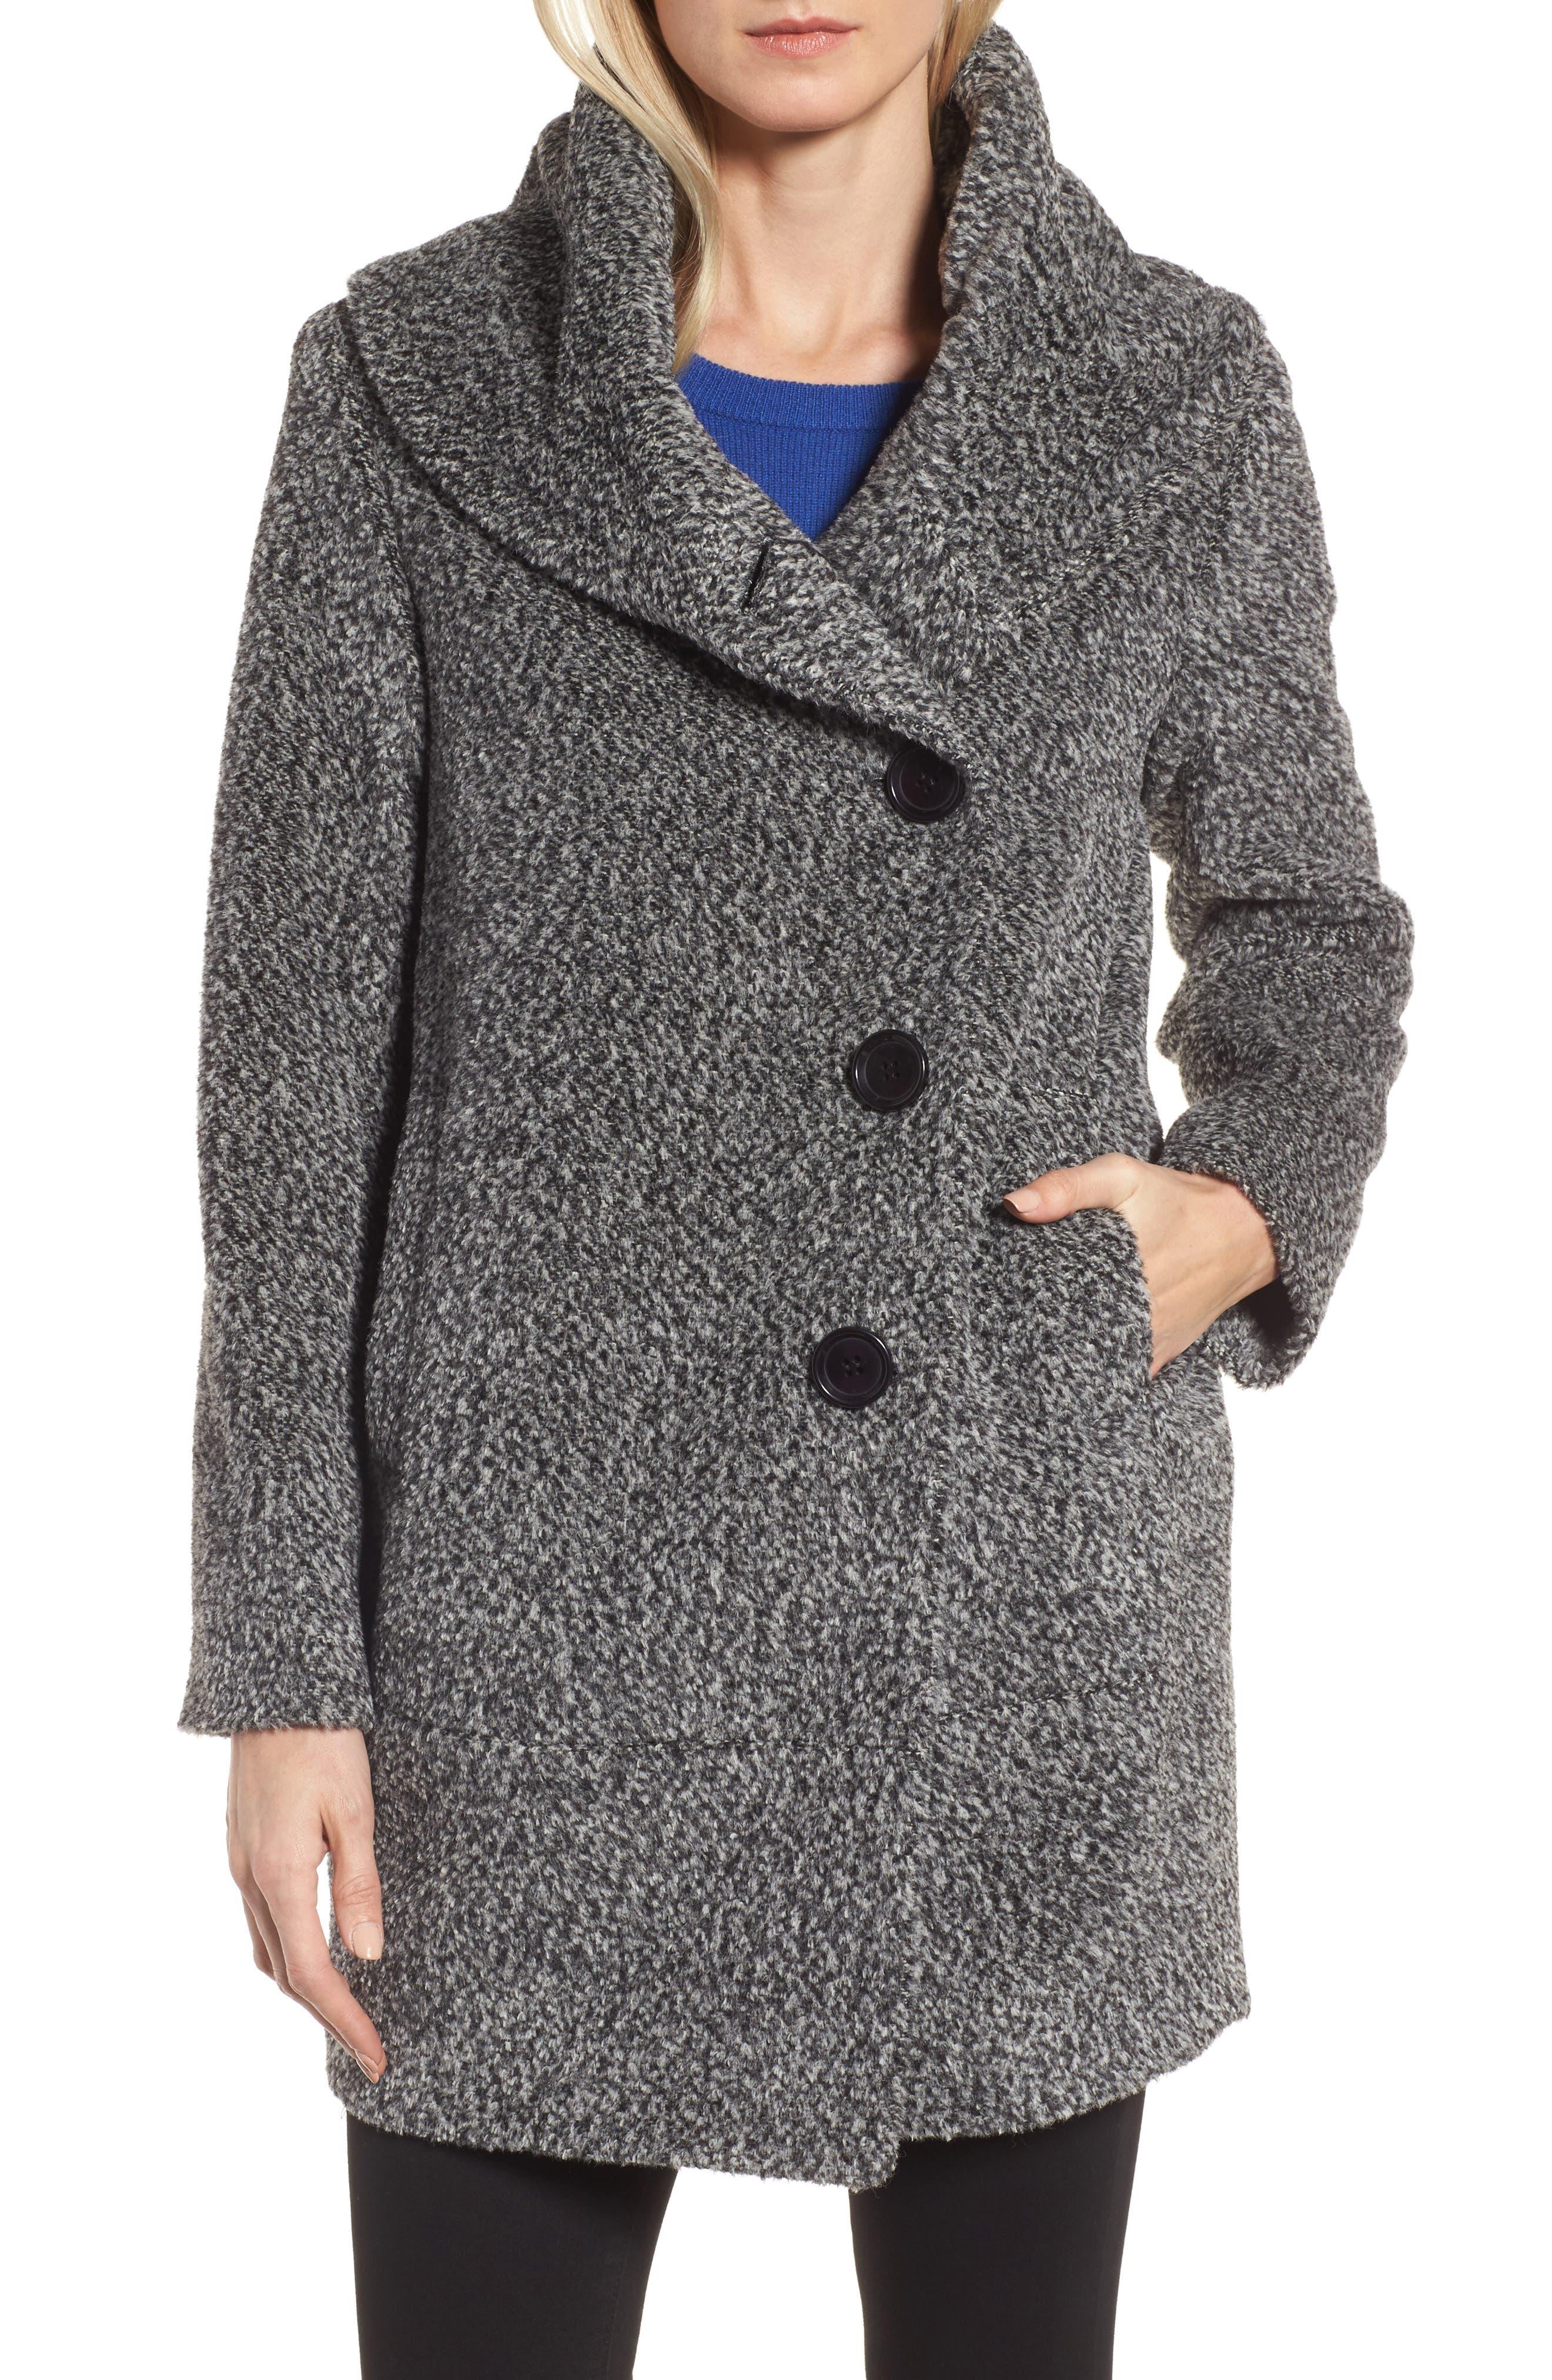 Wool Blend Coat,                         Main,                         color, 011